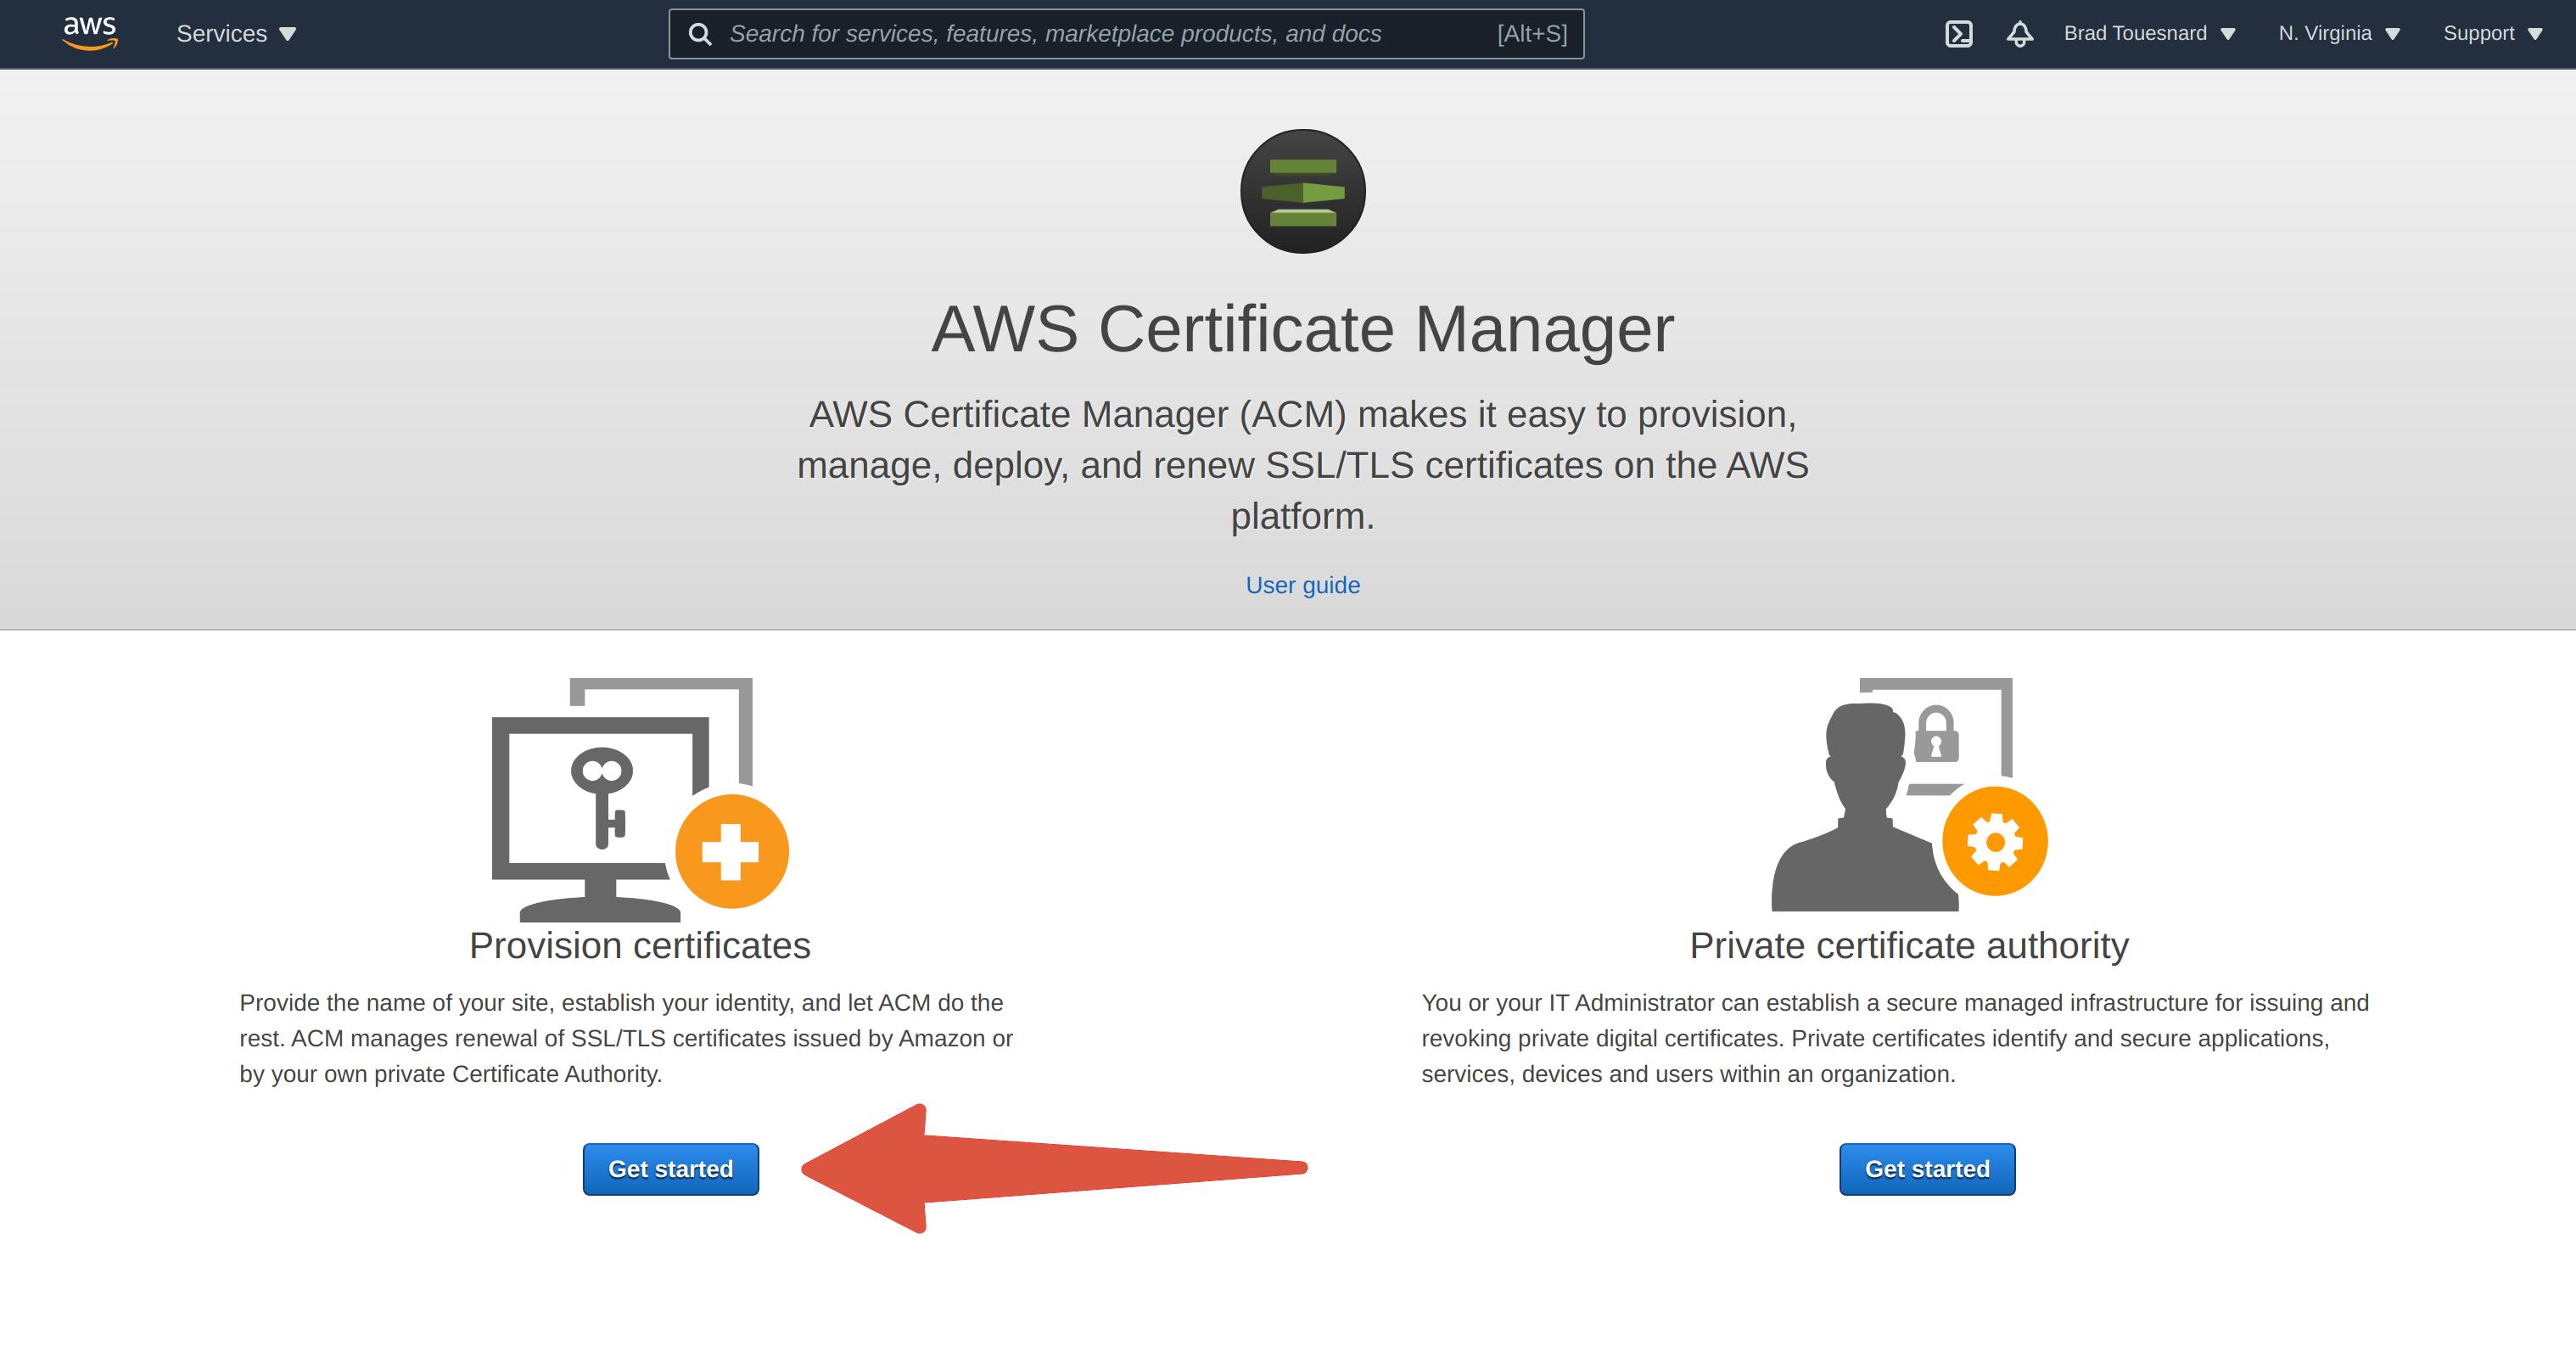 Get start5ed provisioning certificates